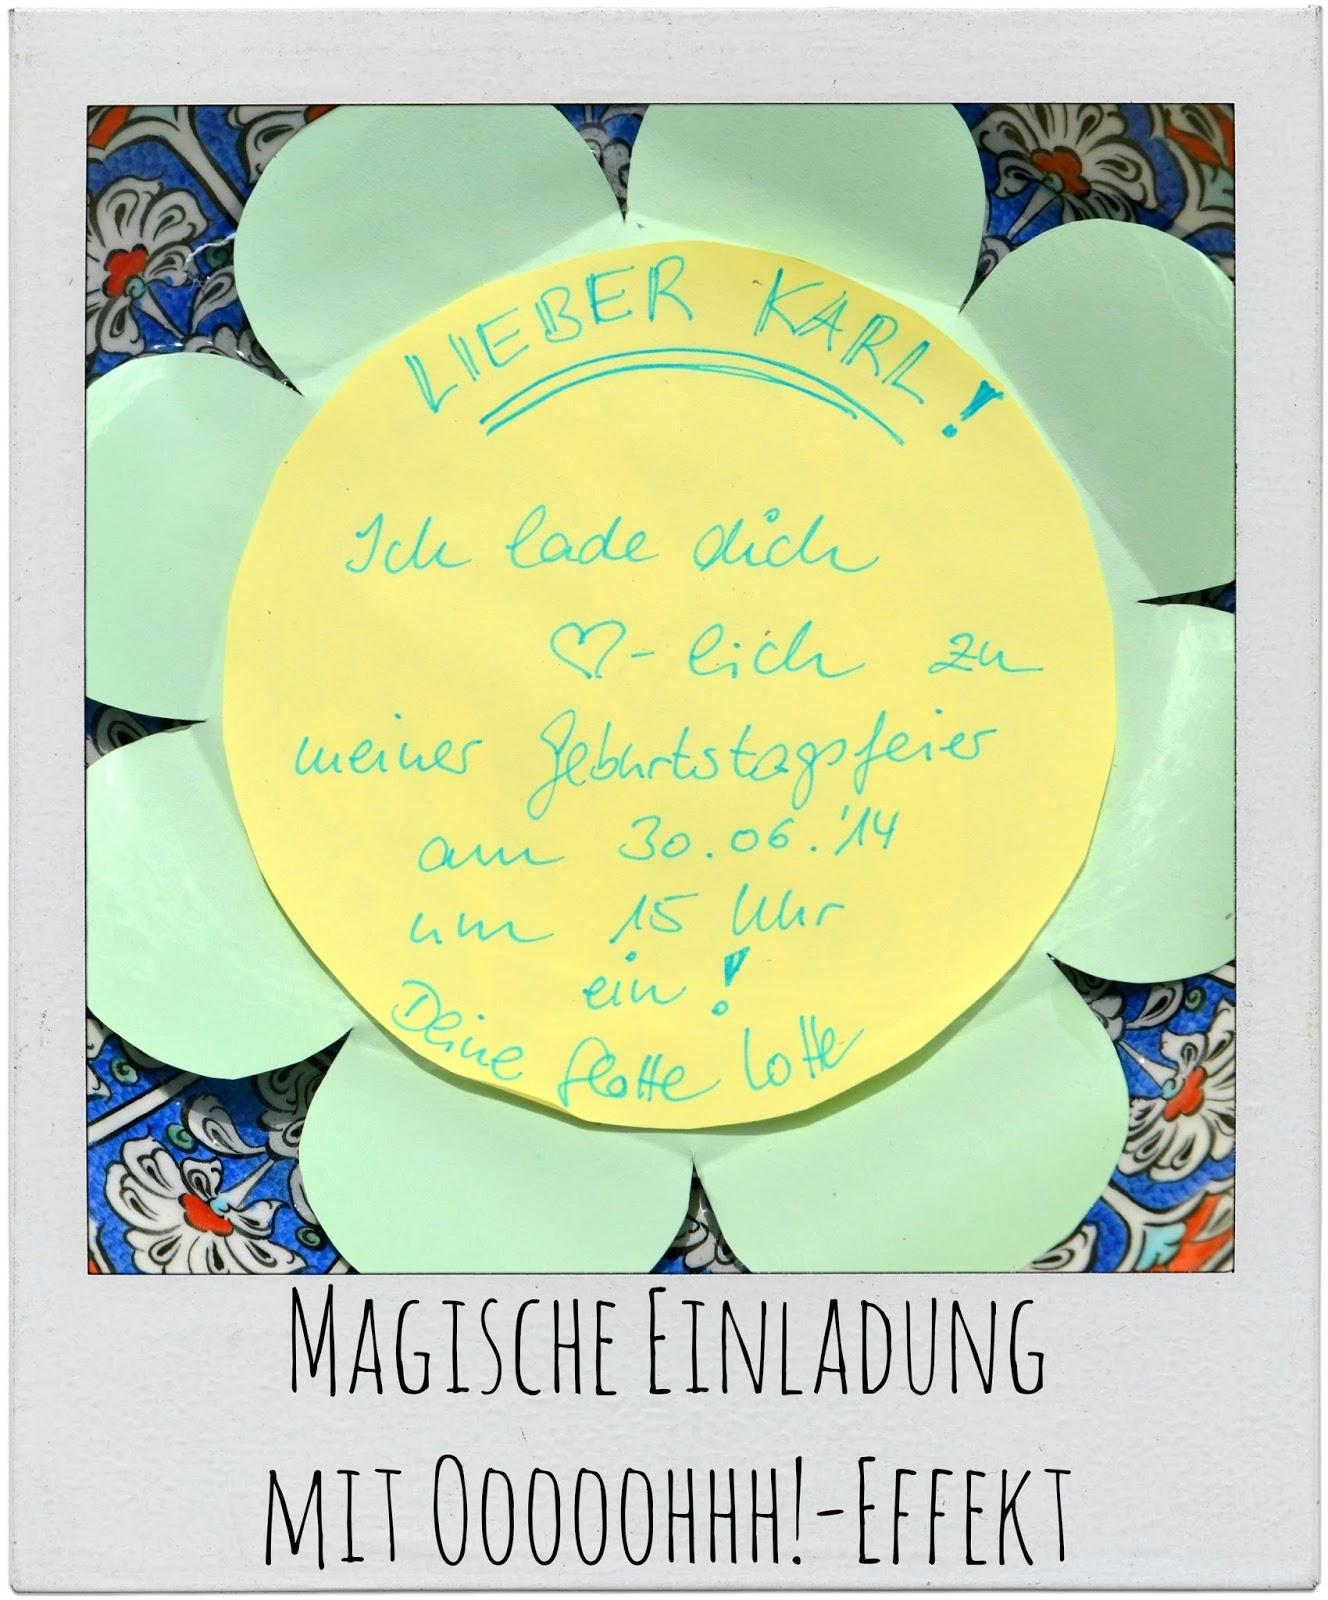 http://gemachtesundgedachtes.blogspot.de/2014/07/tolle-ideen-fuer-den-4-geburtstag.html